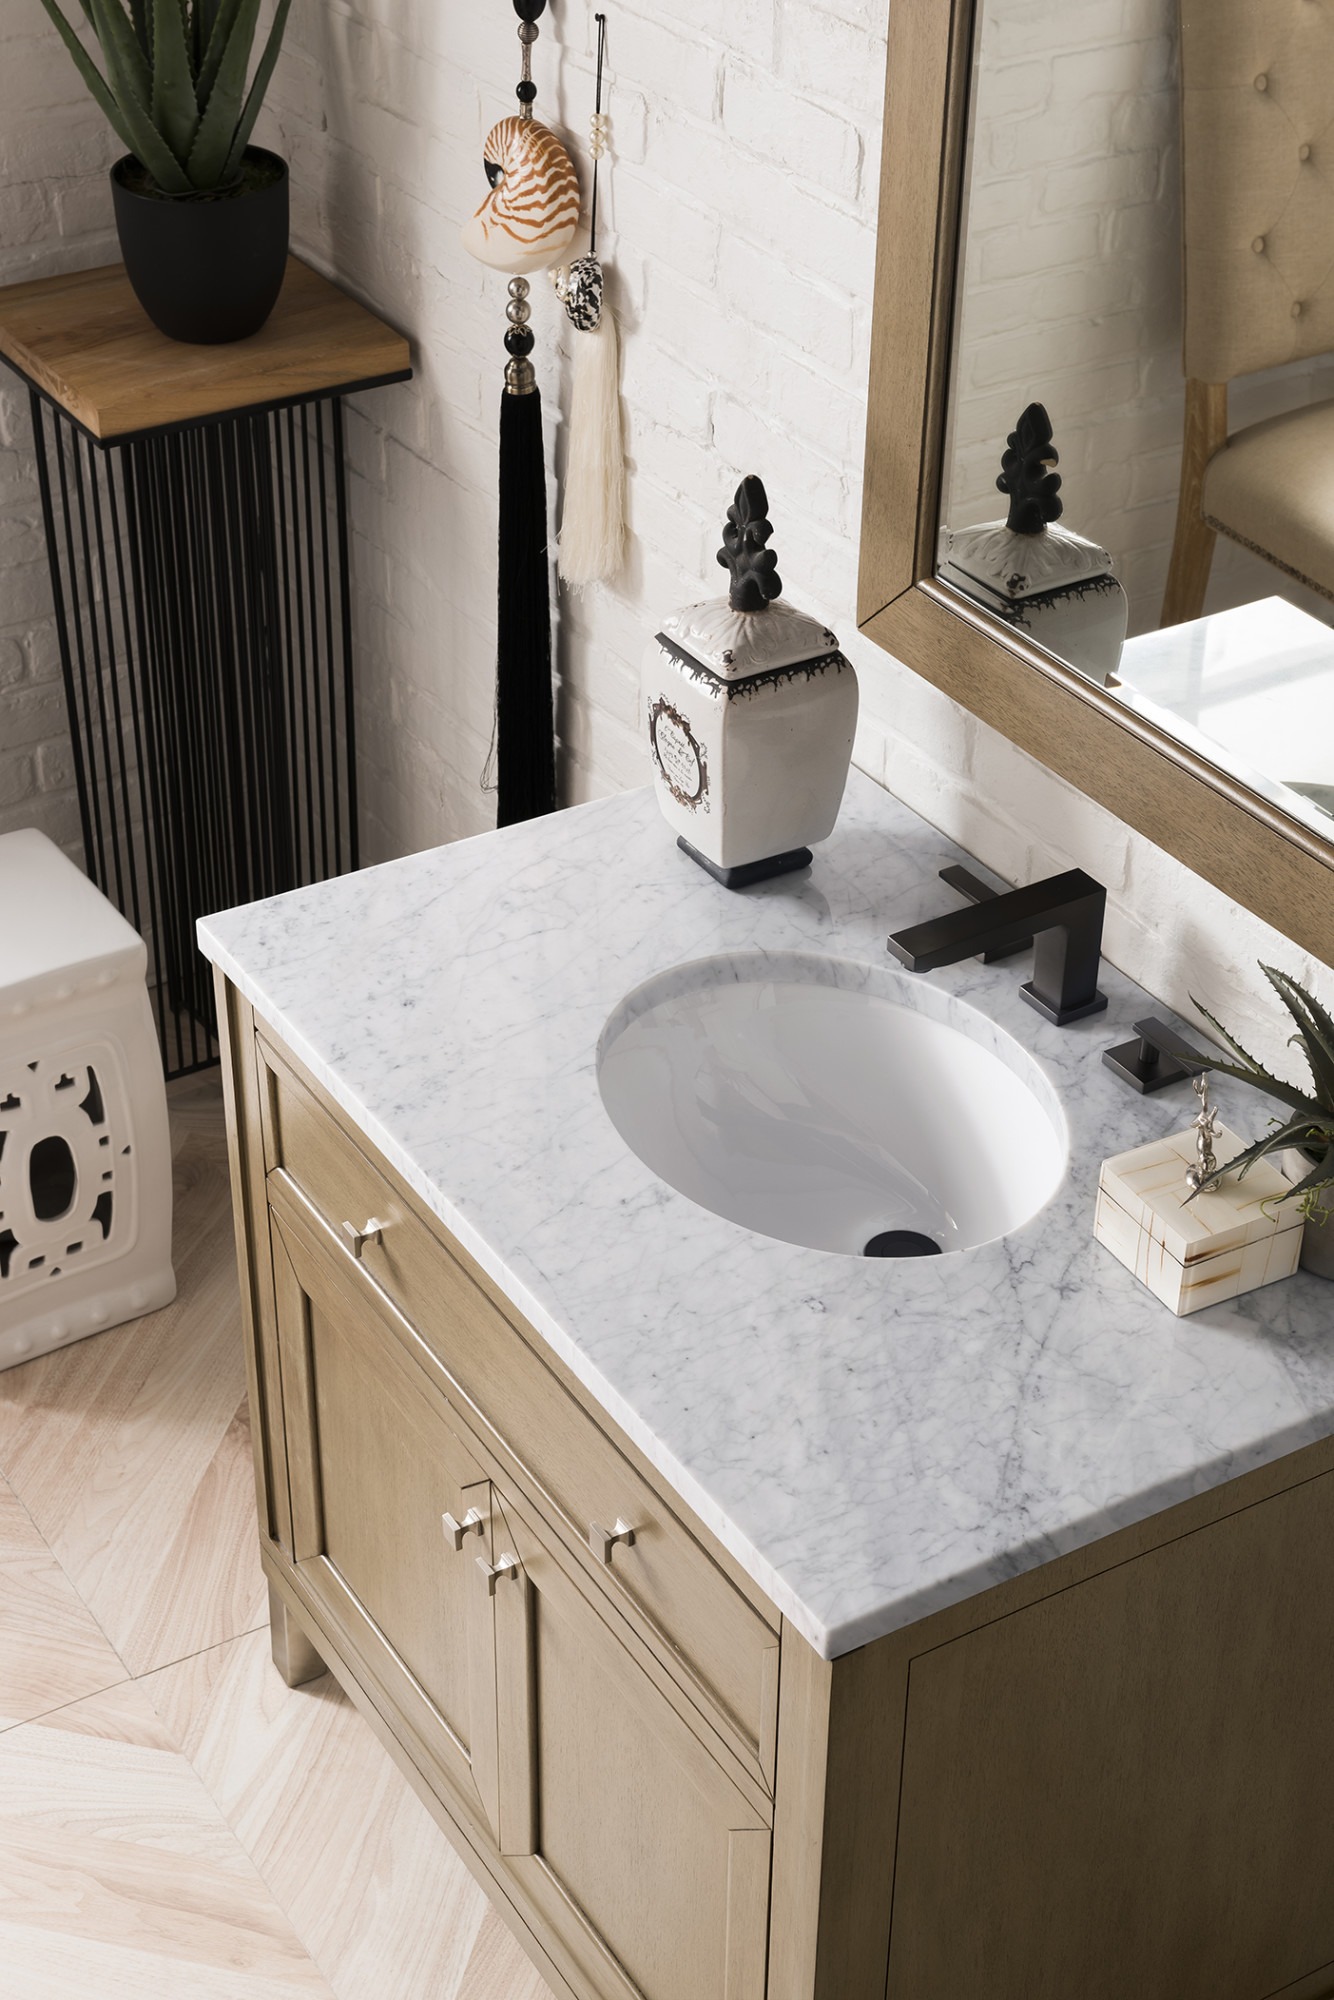 James Martin Furniture 305 V36 Www 3ocar 36 In Chicago White Washed Walnut Single Bathroom Vanity With 3 Cm Carrara White Top Oval Sink Walmart Com Walmart Com